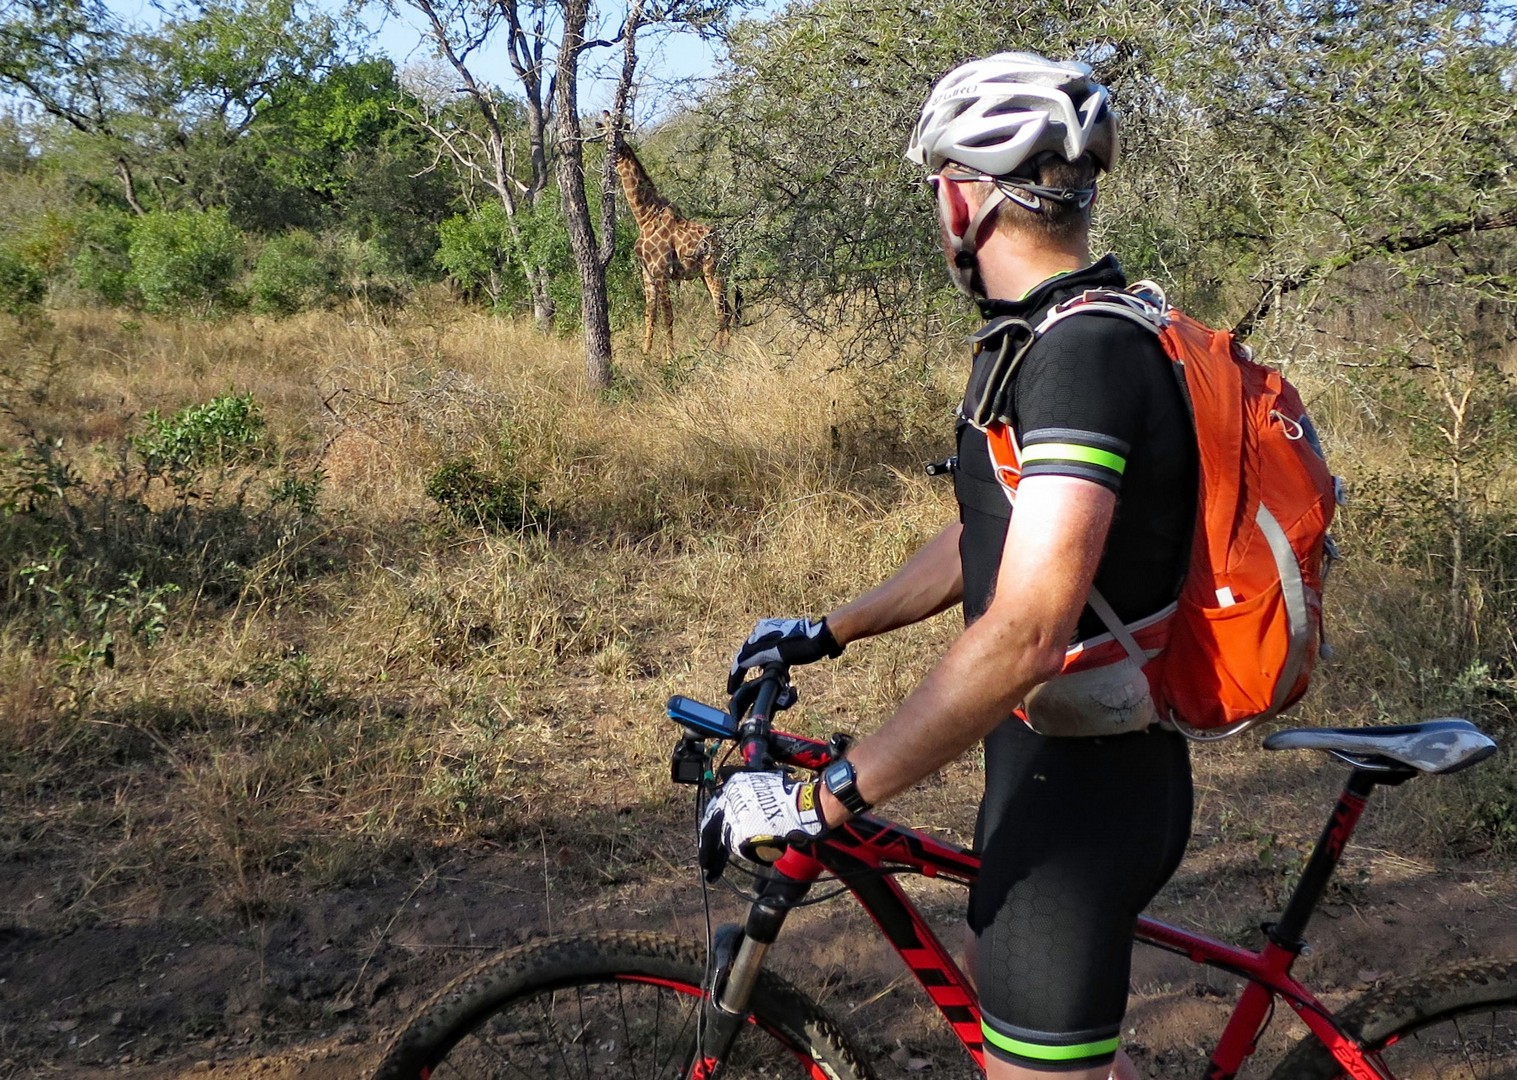 cycling-holiday-in-swaziland-cycling-adventure-africa-cycling safari.jpg - Swaziland (Eswatini) - Cycling Safari - Cycling Adventures